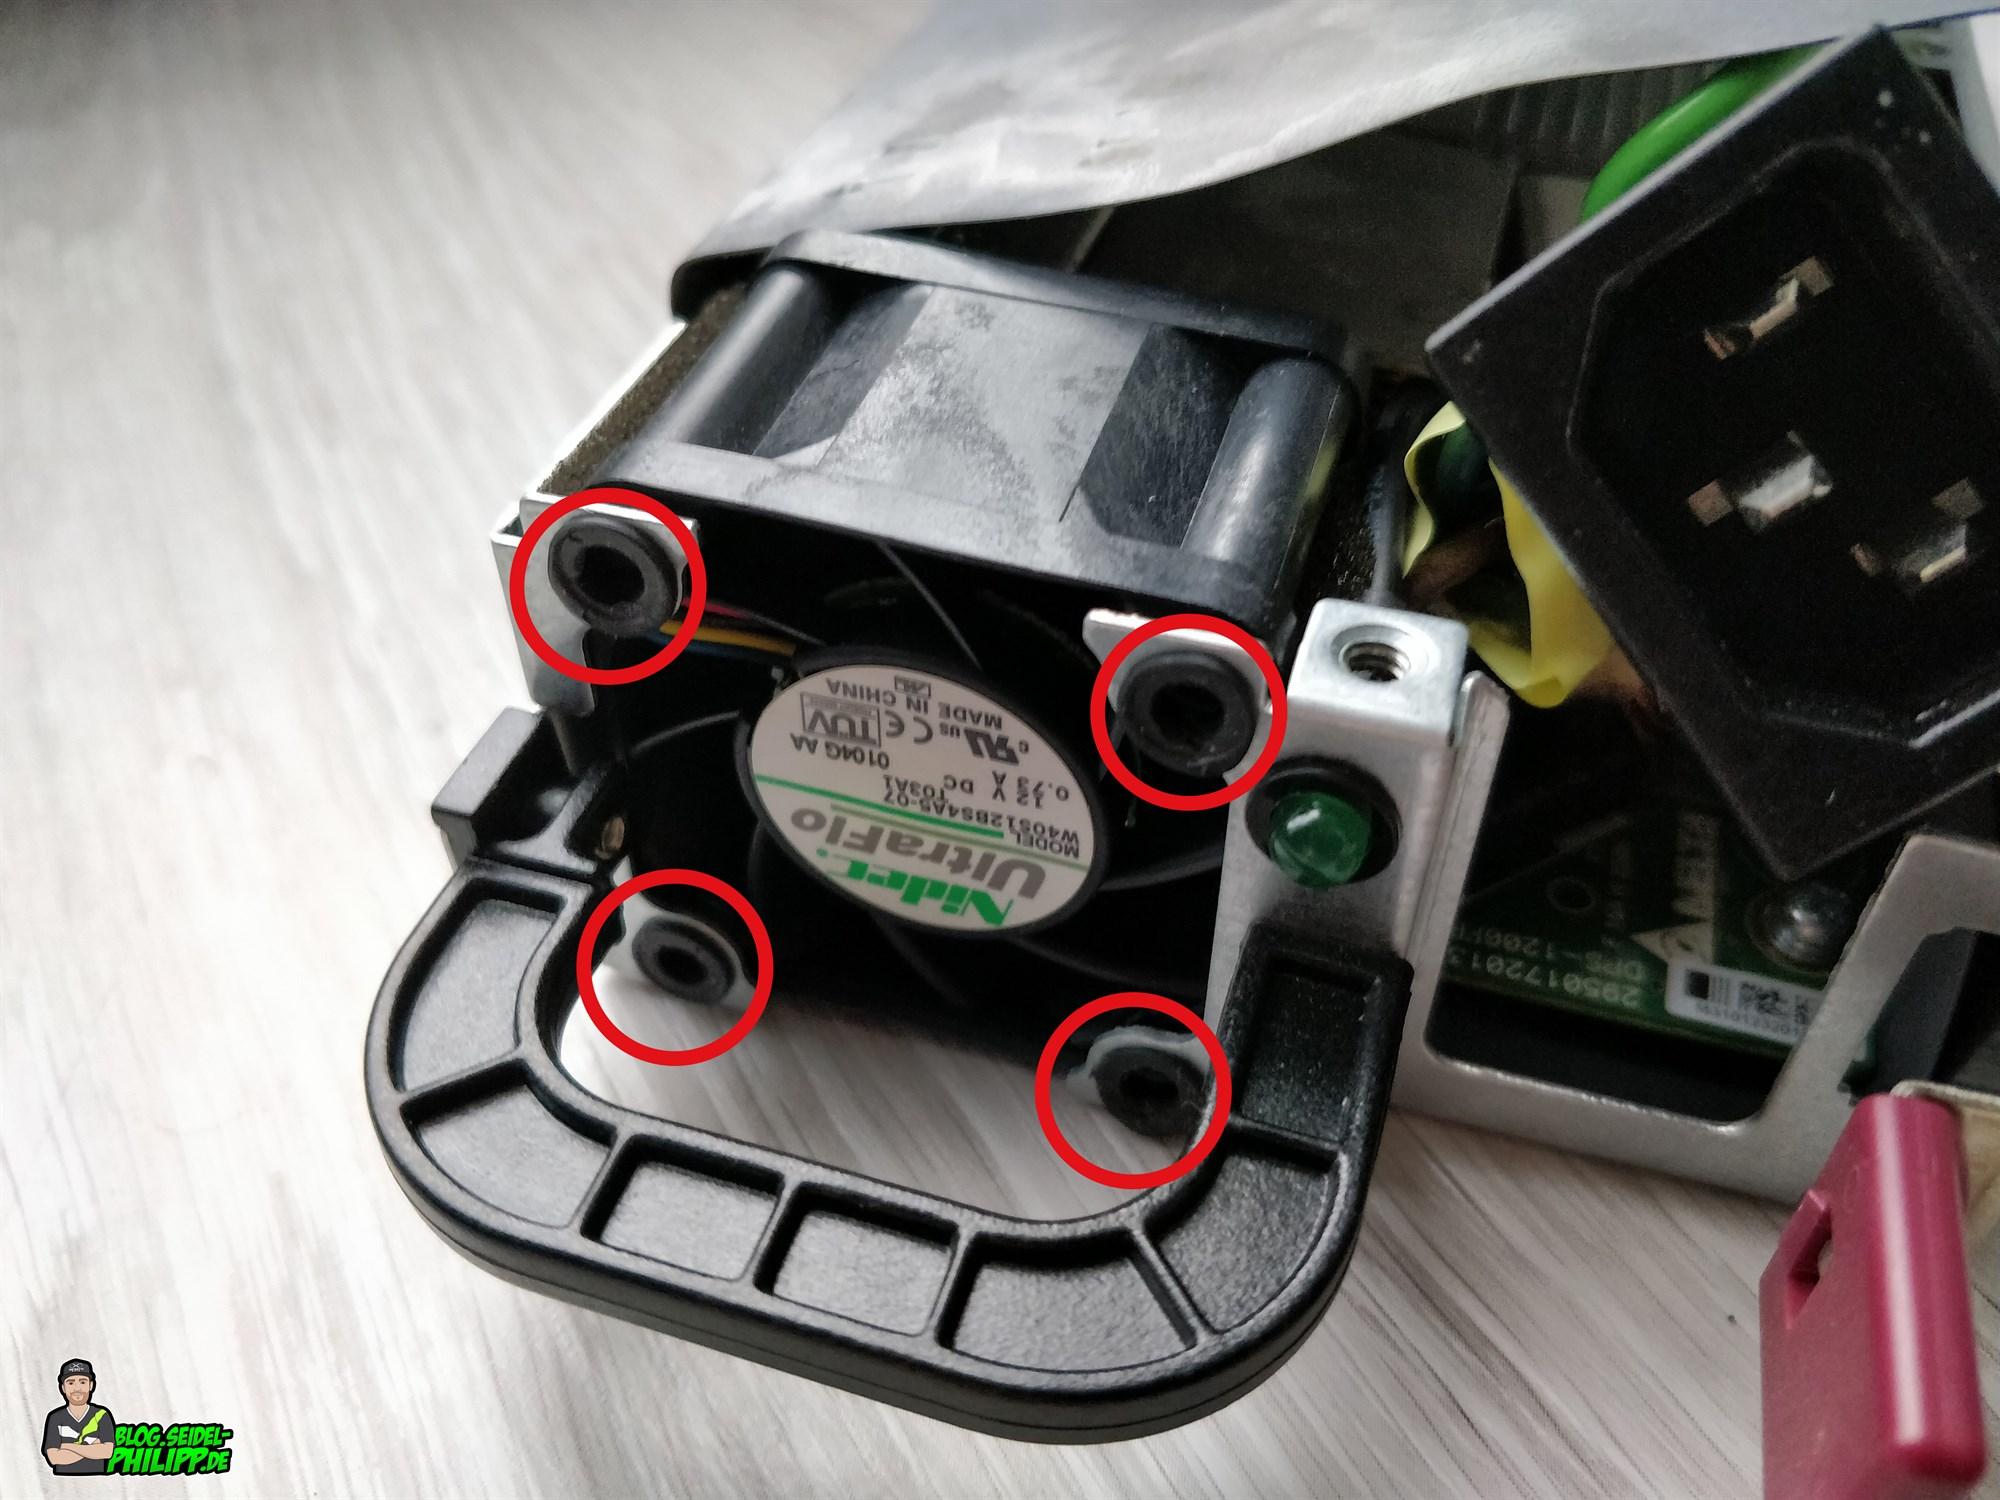 HP DPS-1200FB Power Supply Hack for charging LiPos (12 V / 24 V)